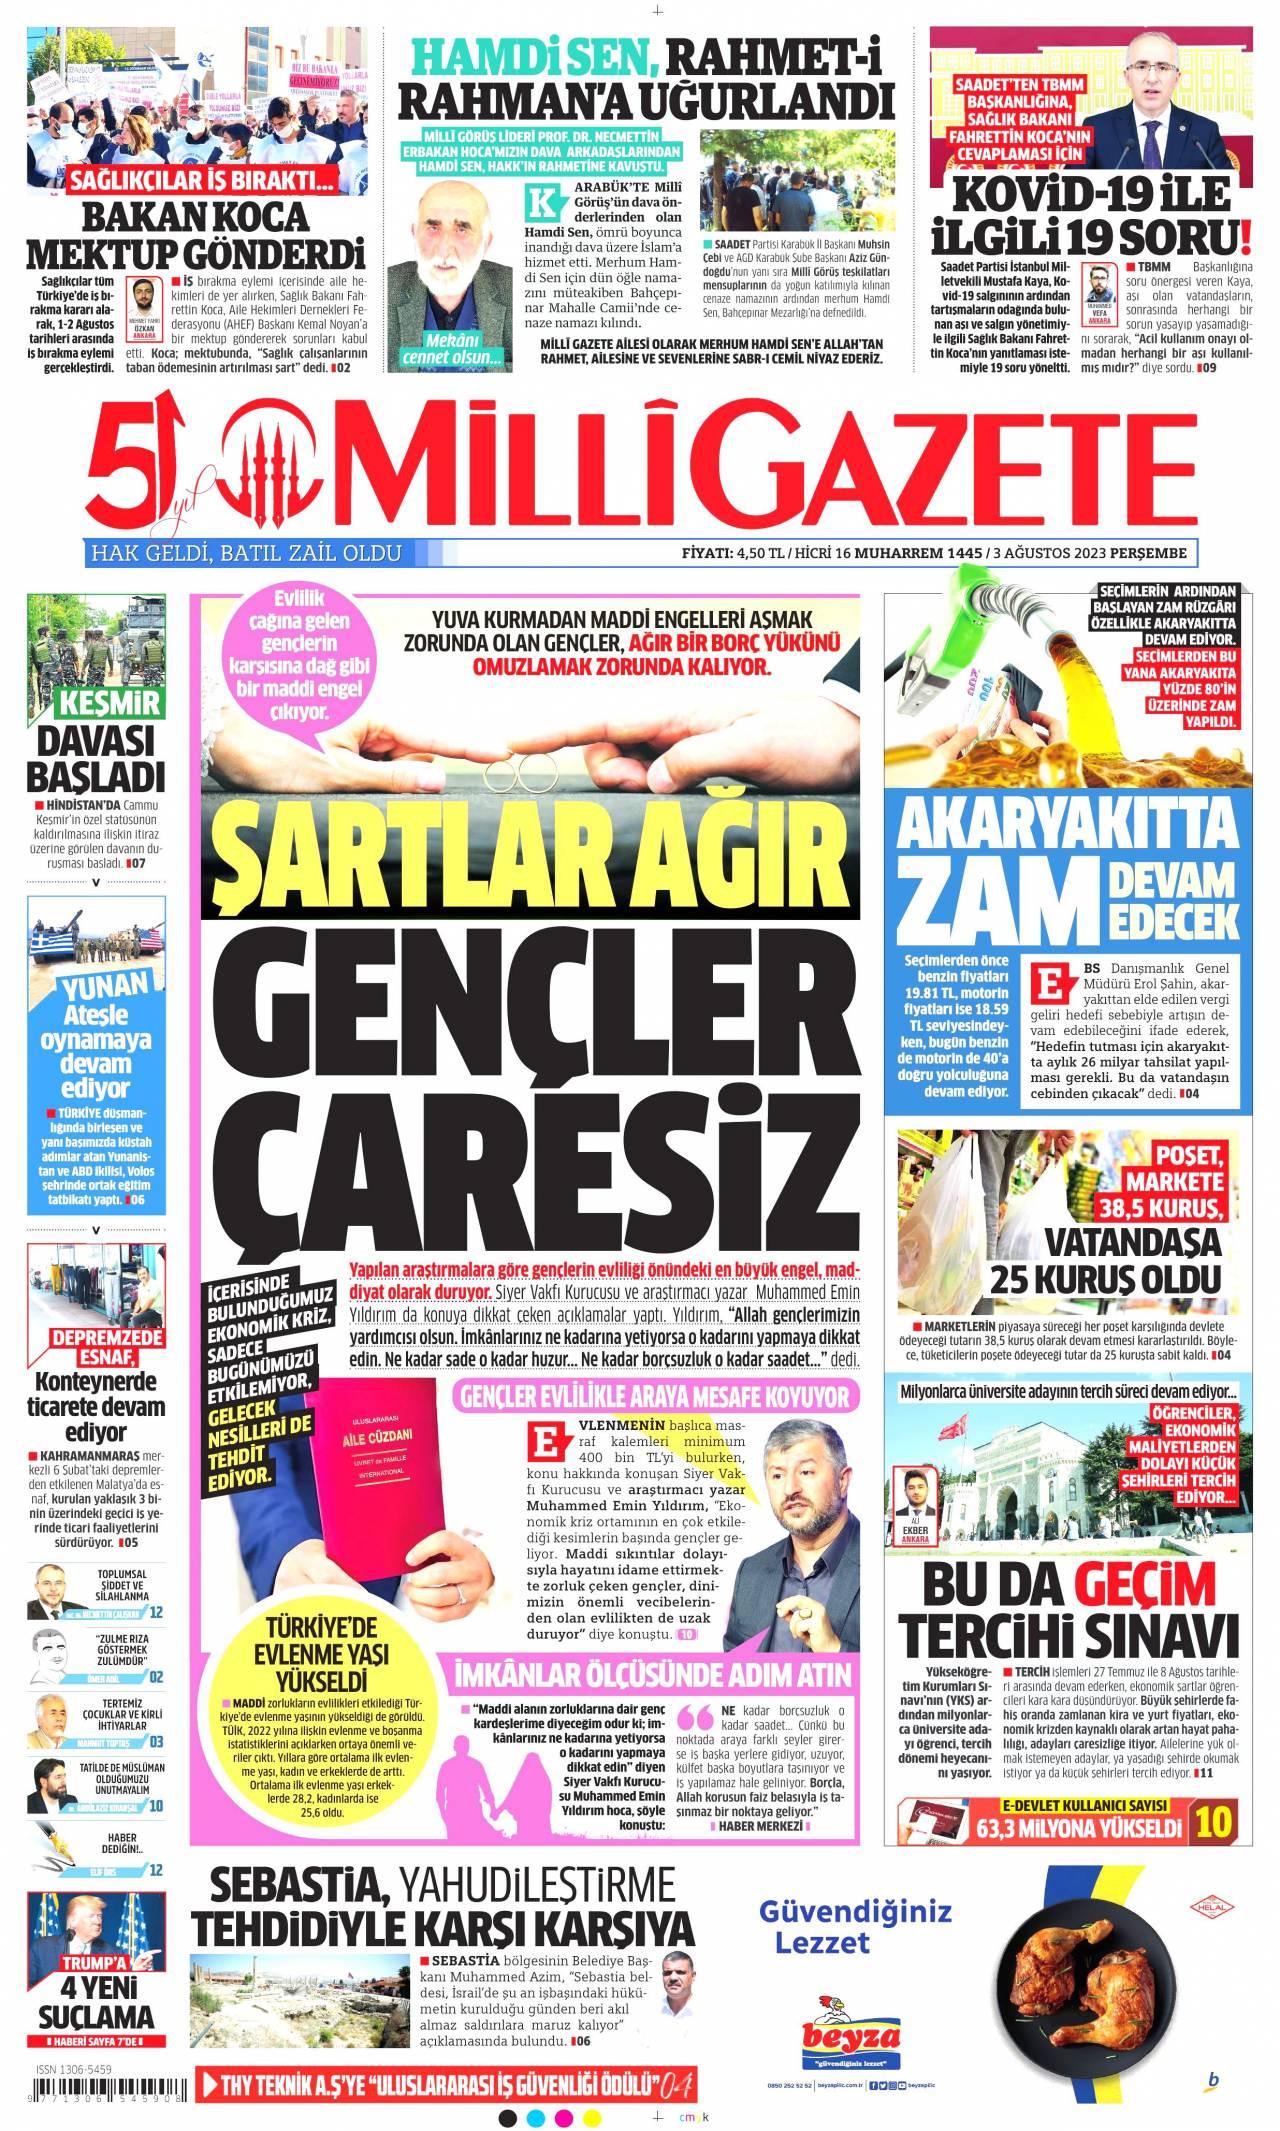 23 Ağustos 2019, Cuma milligazete Gazetesi